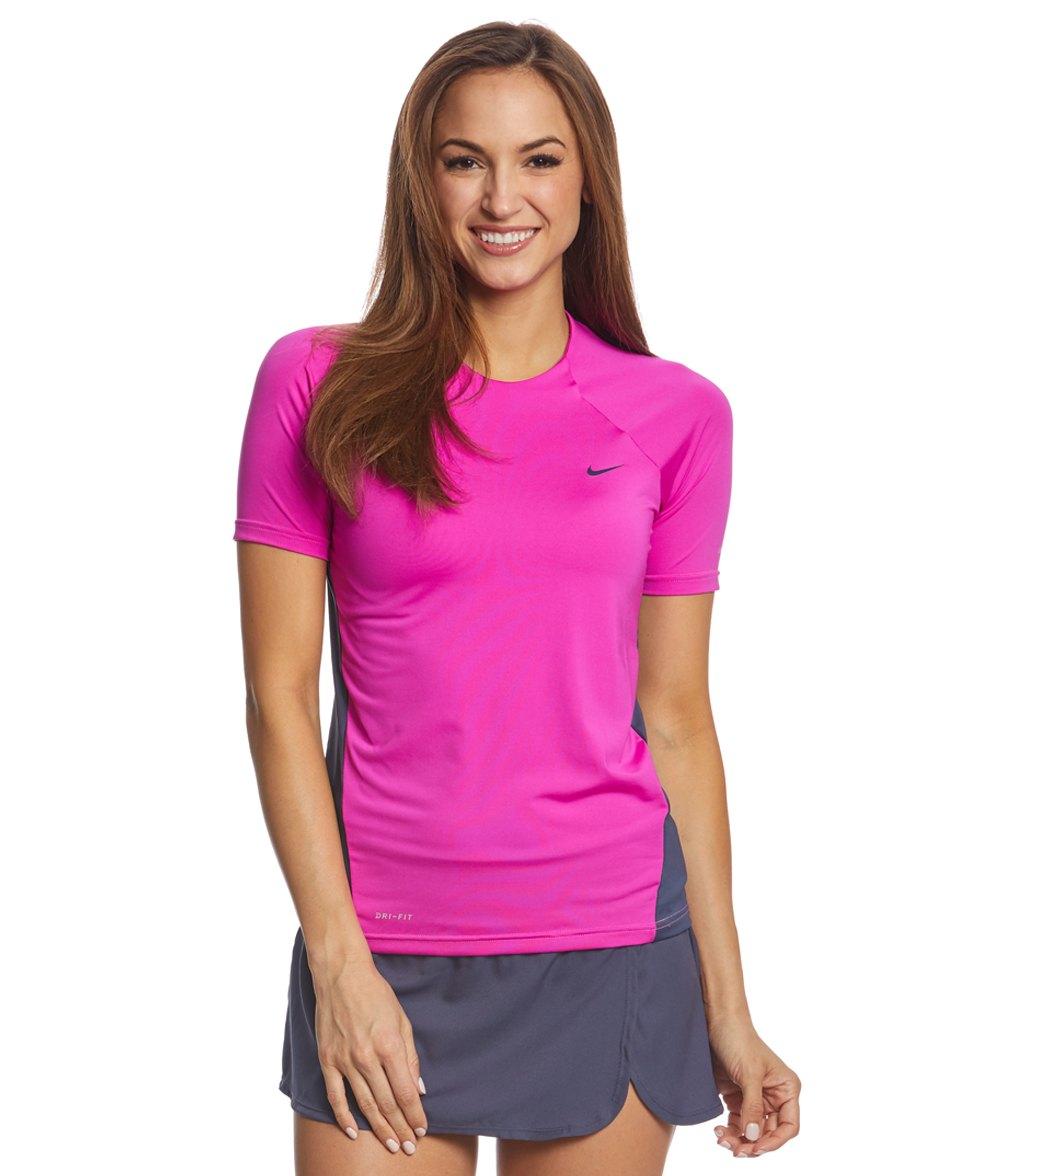 617859c6d Nike Women's Dri-FIT S/S Hydroguard at SwimOutlet.com